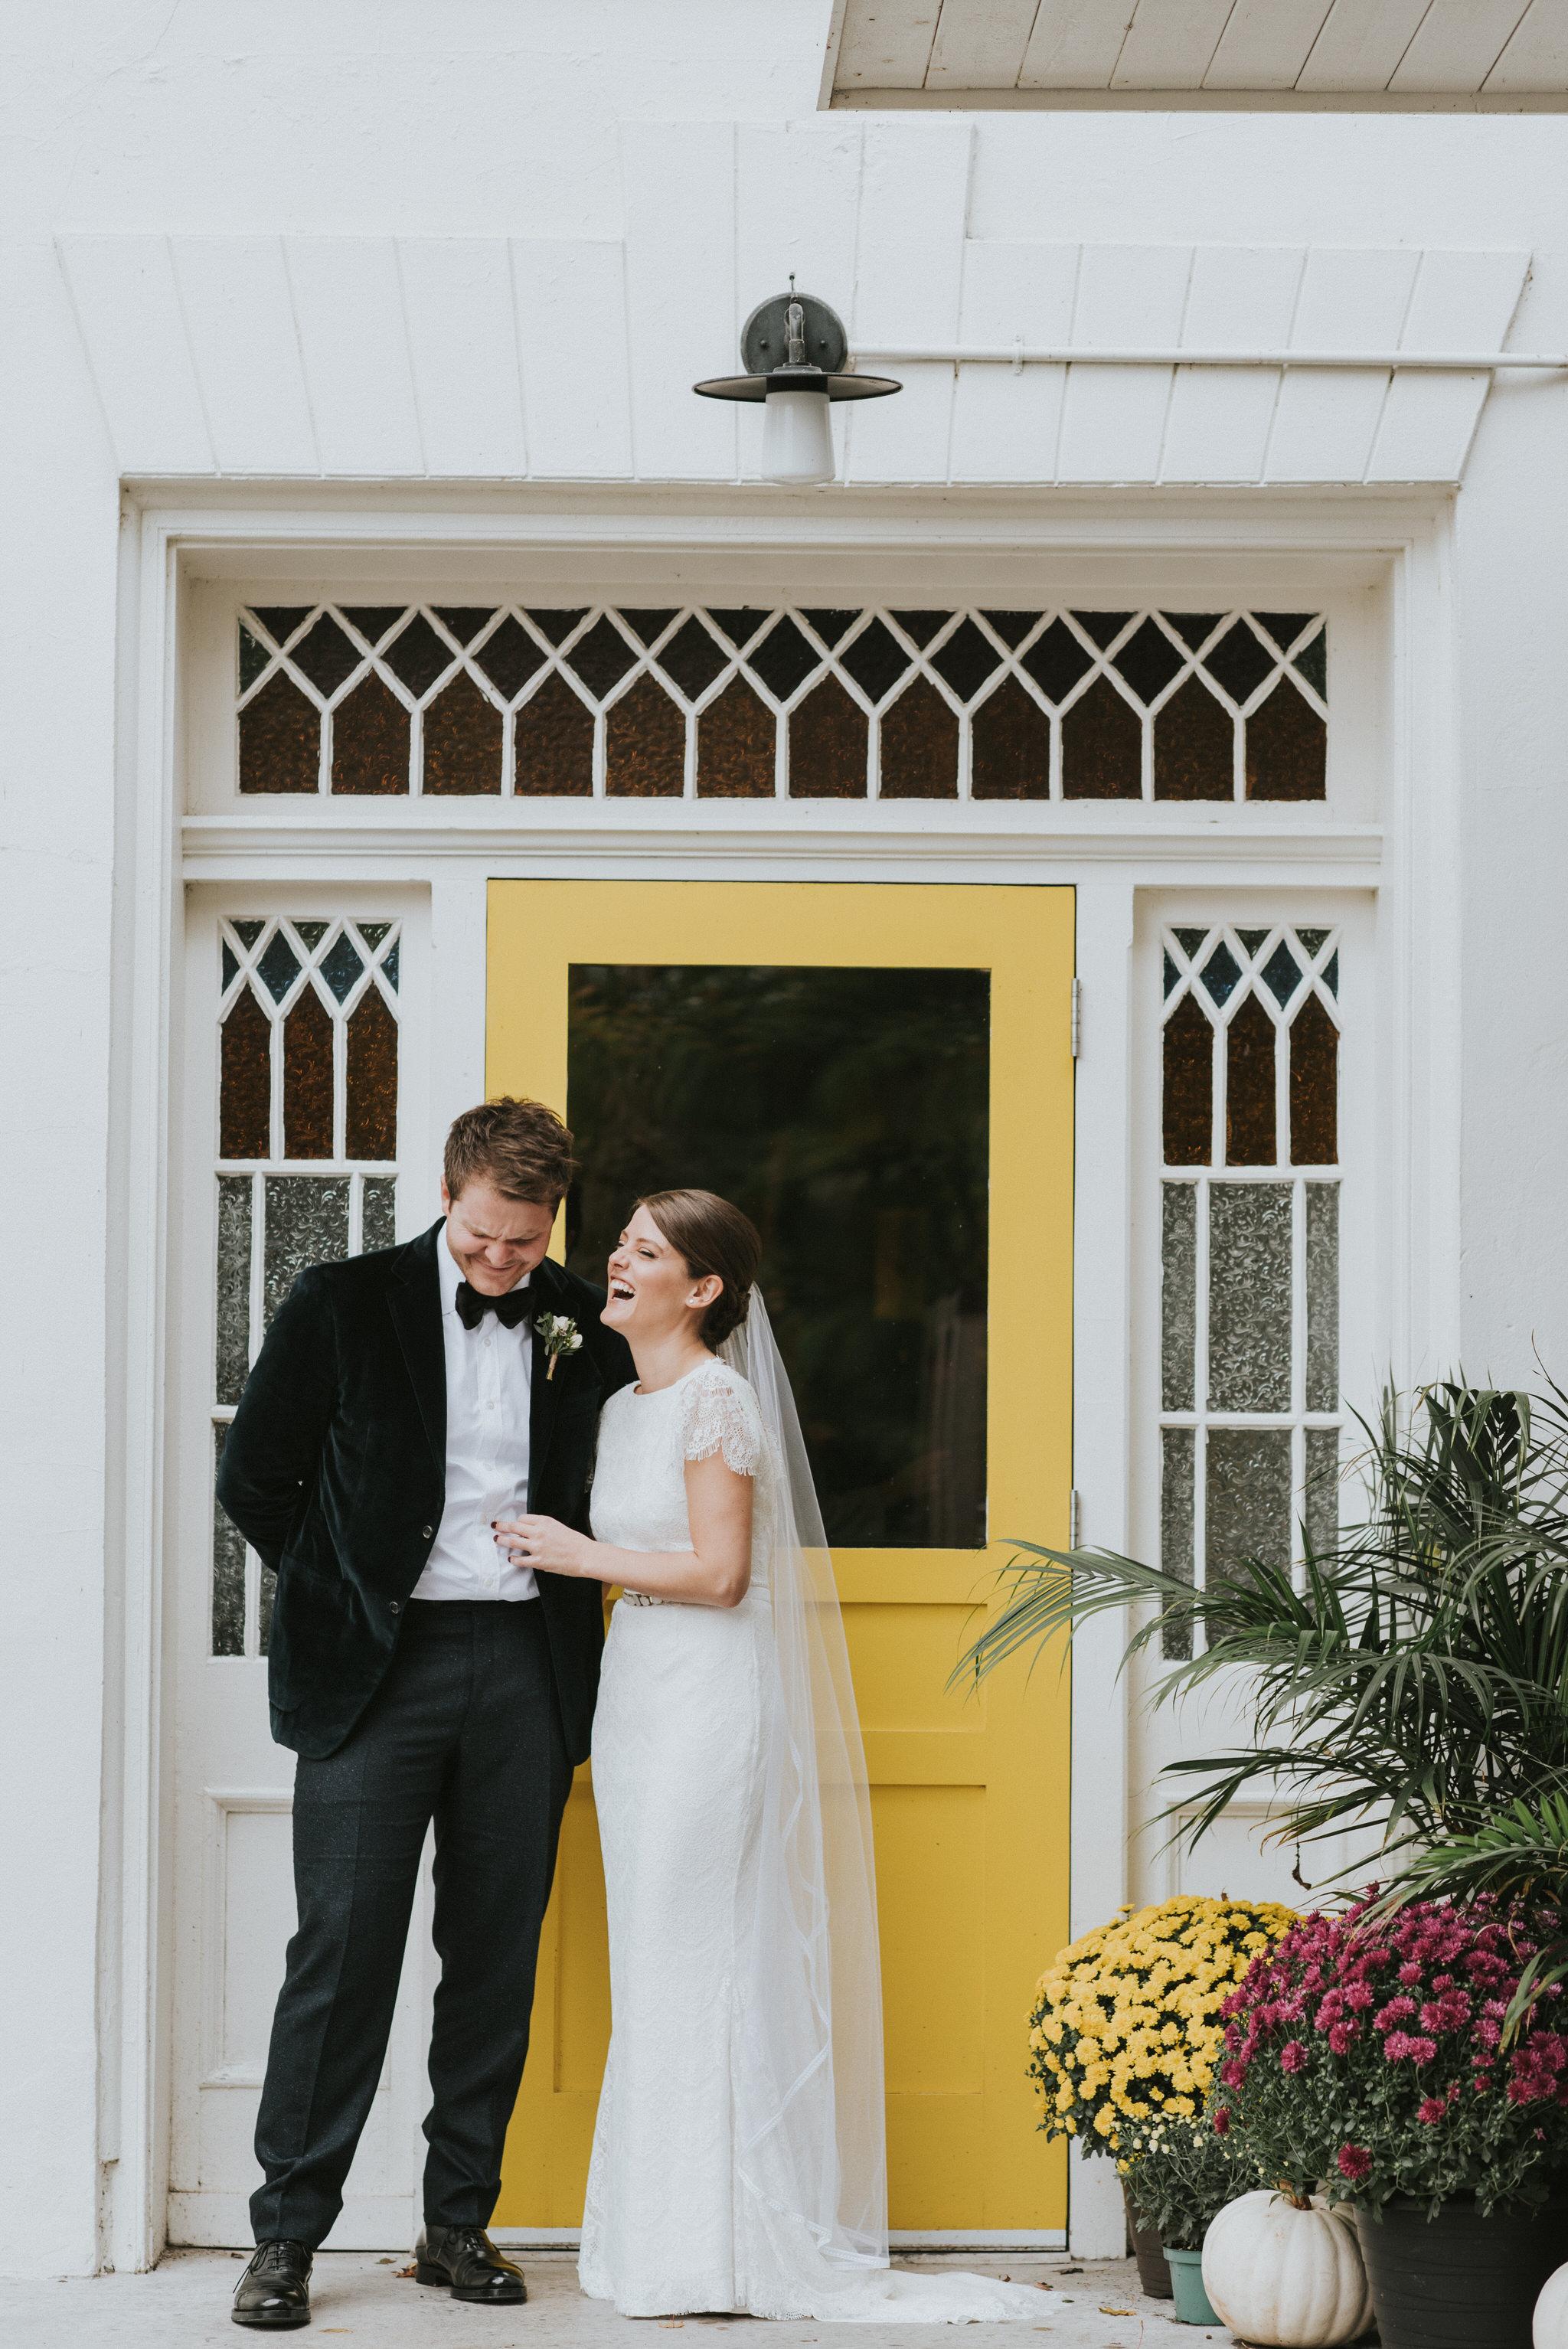 scarletoneillphotography_weddingphotography_prince edward county weddings050.JPG